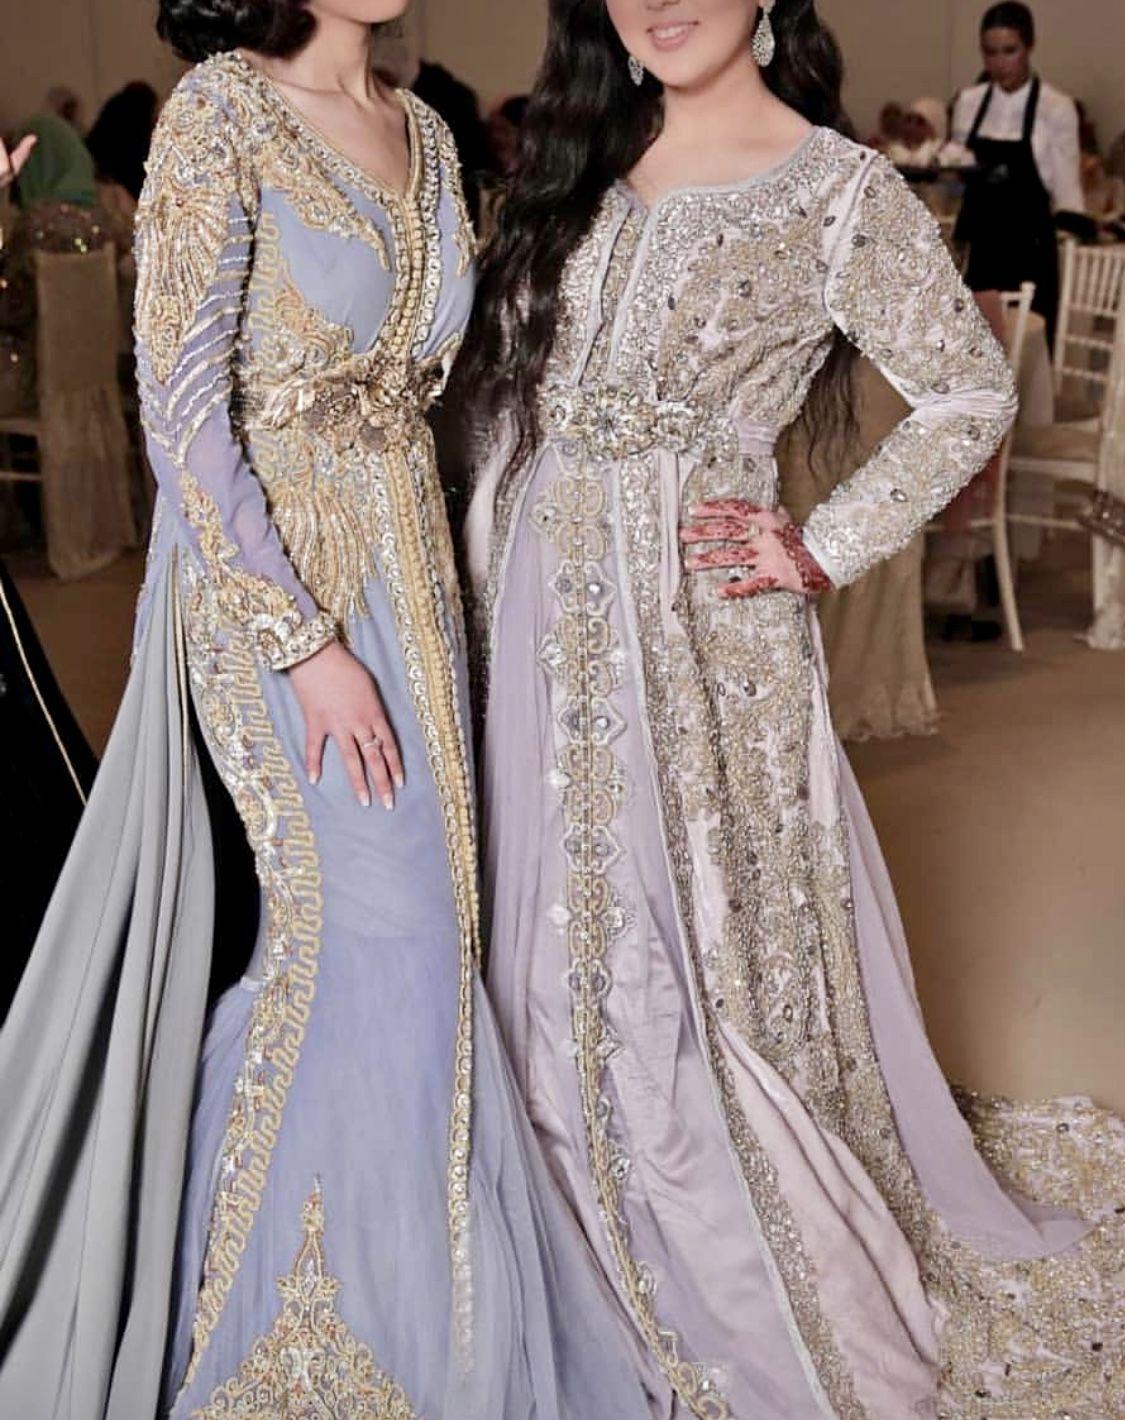 Pin By Carola J Read On Kaftans Pinterest Caftans Kaftan And Jolie Clothing Aftan Dress Abayas